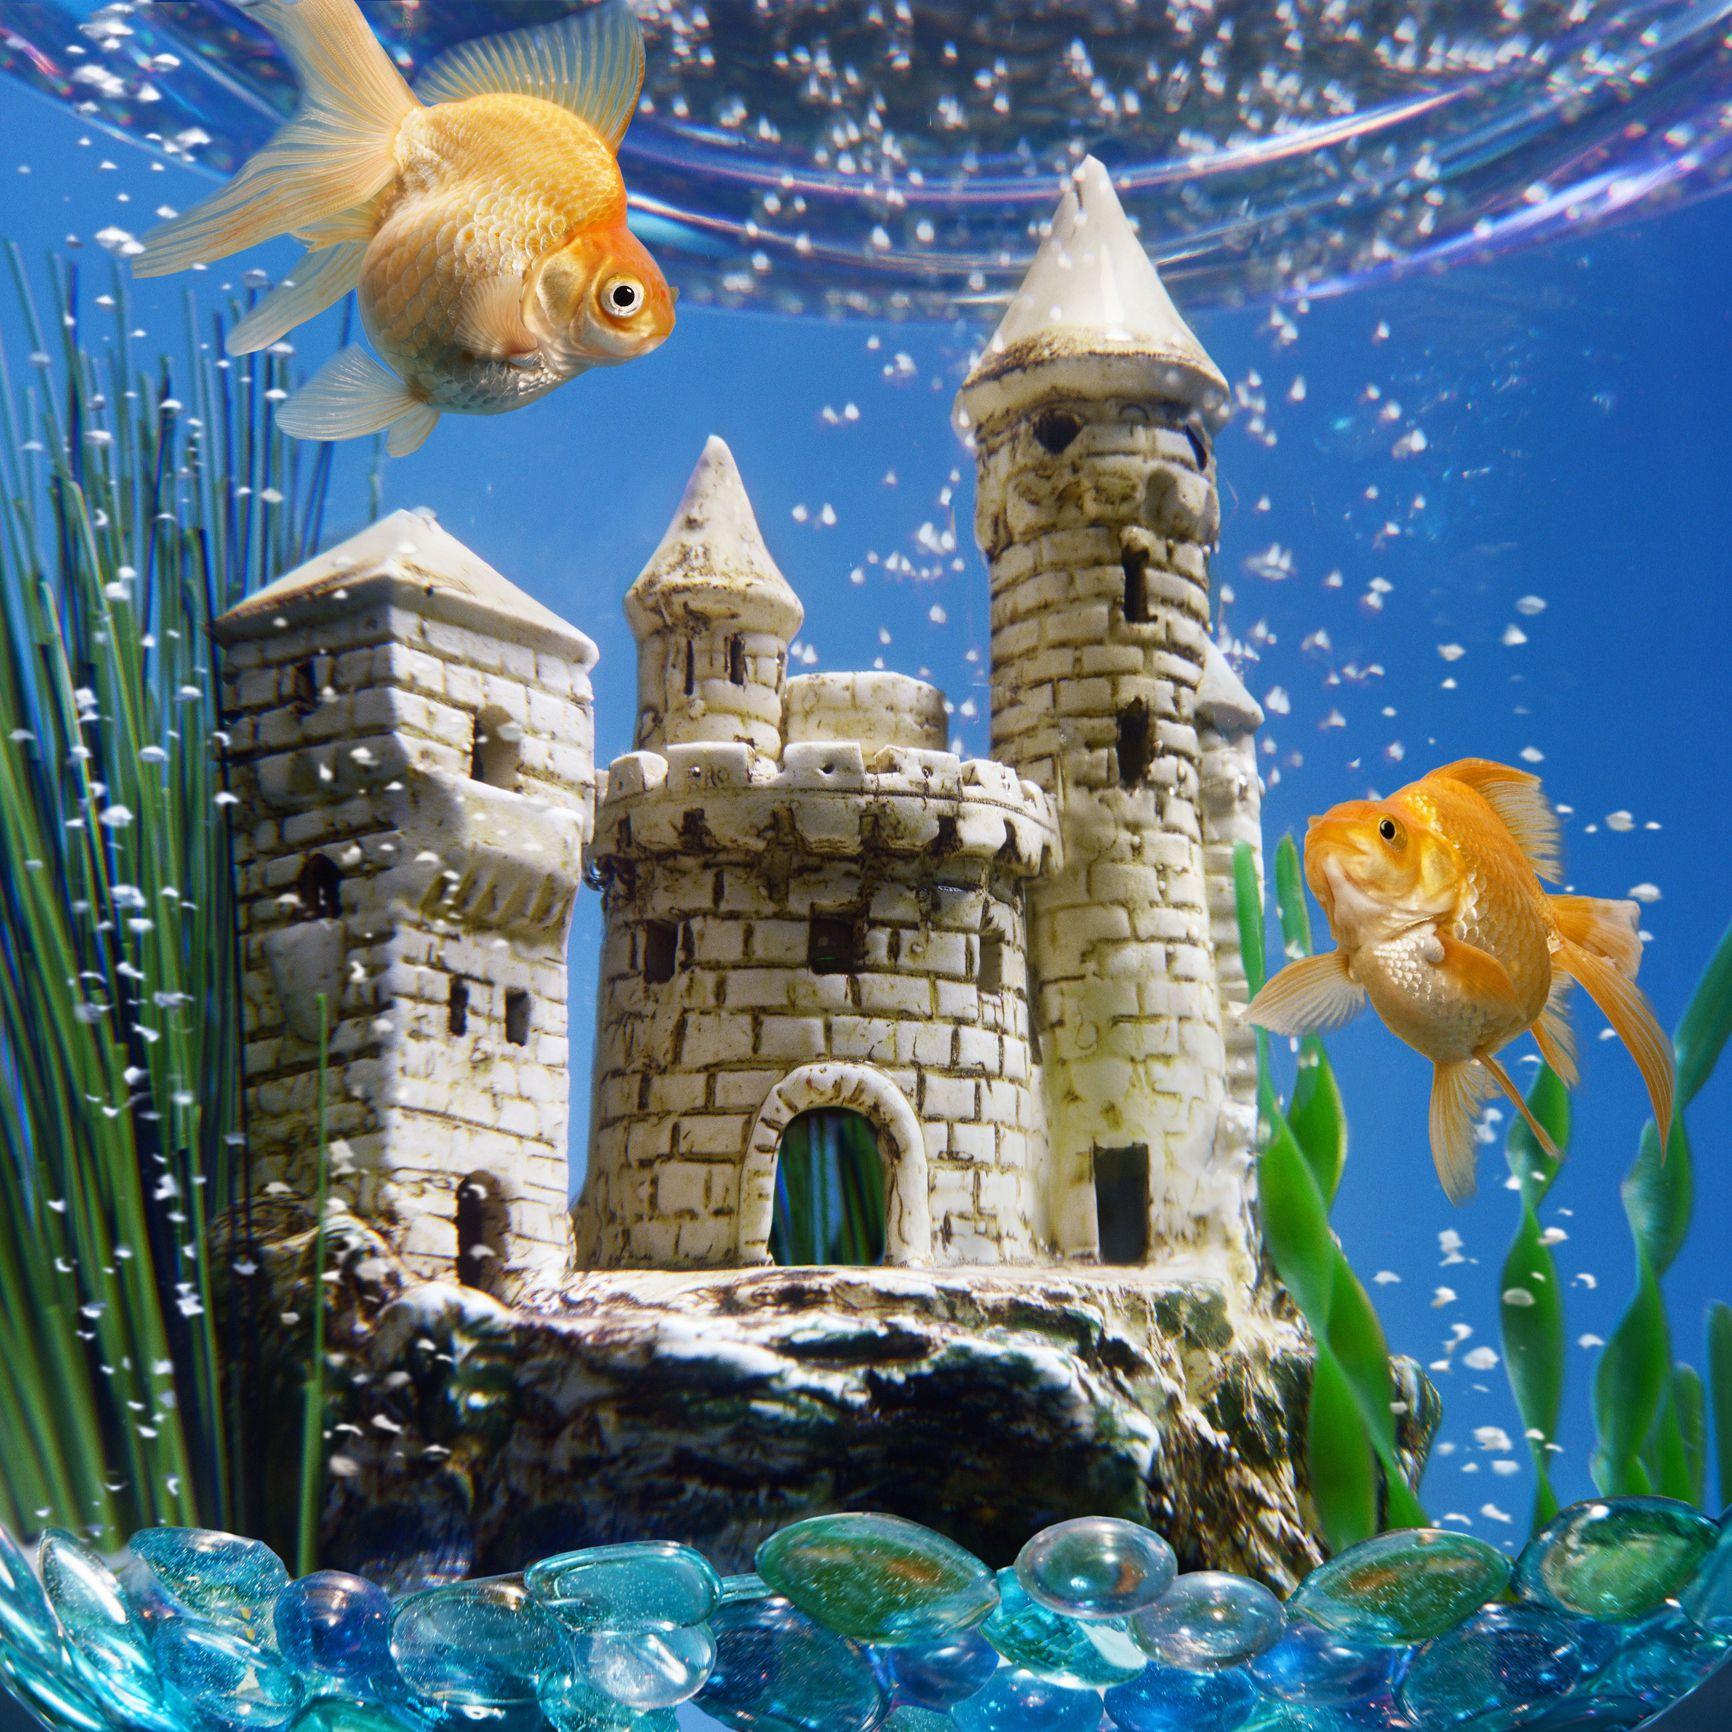 Benefits and Equipment for Aquarium Water Movement